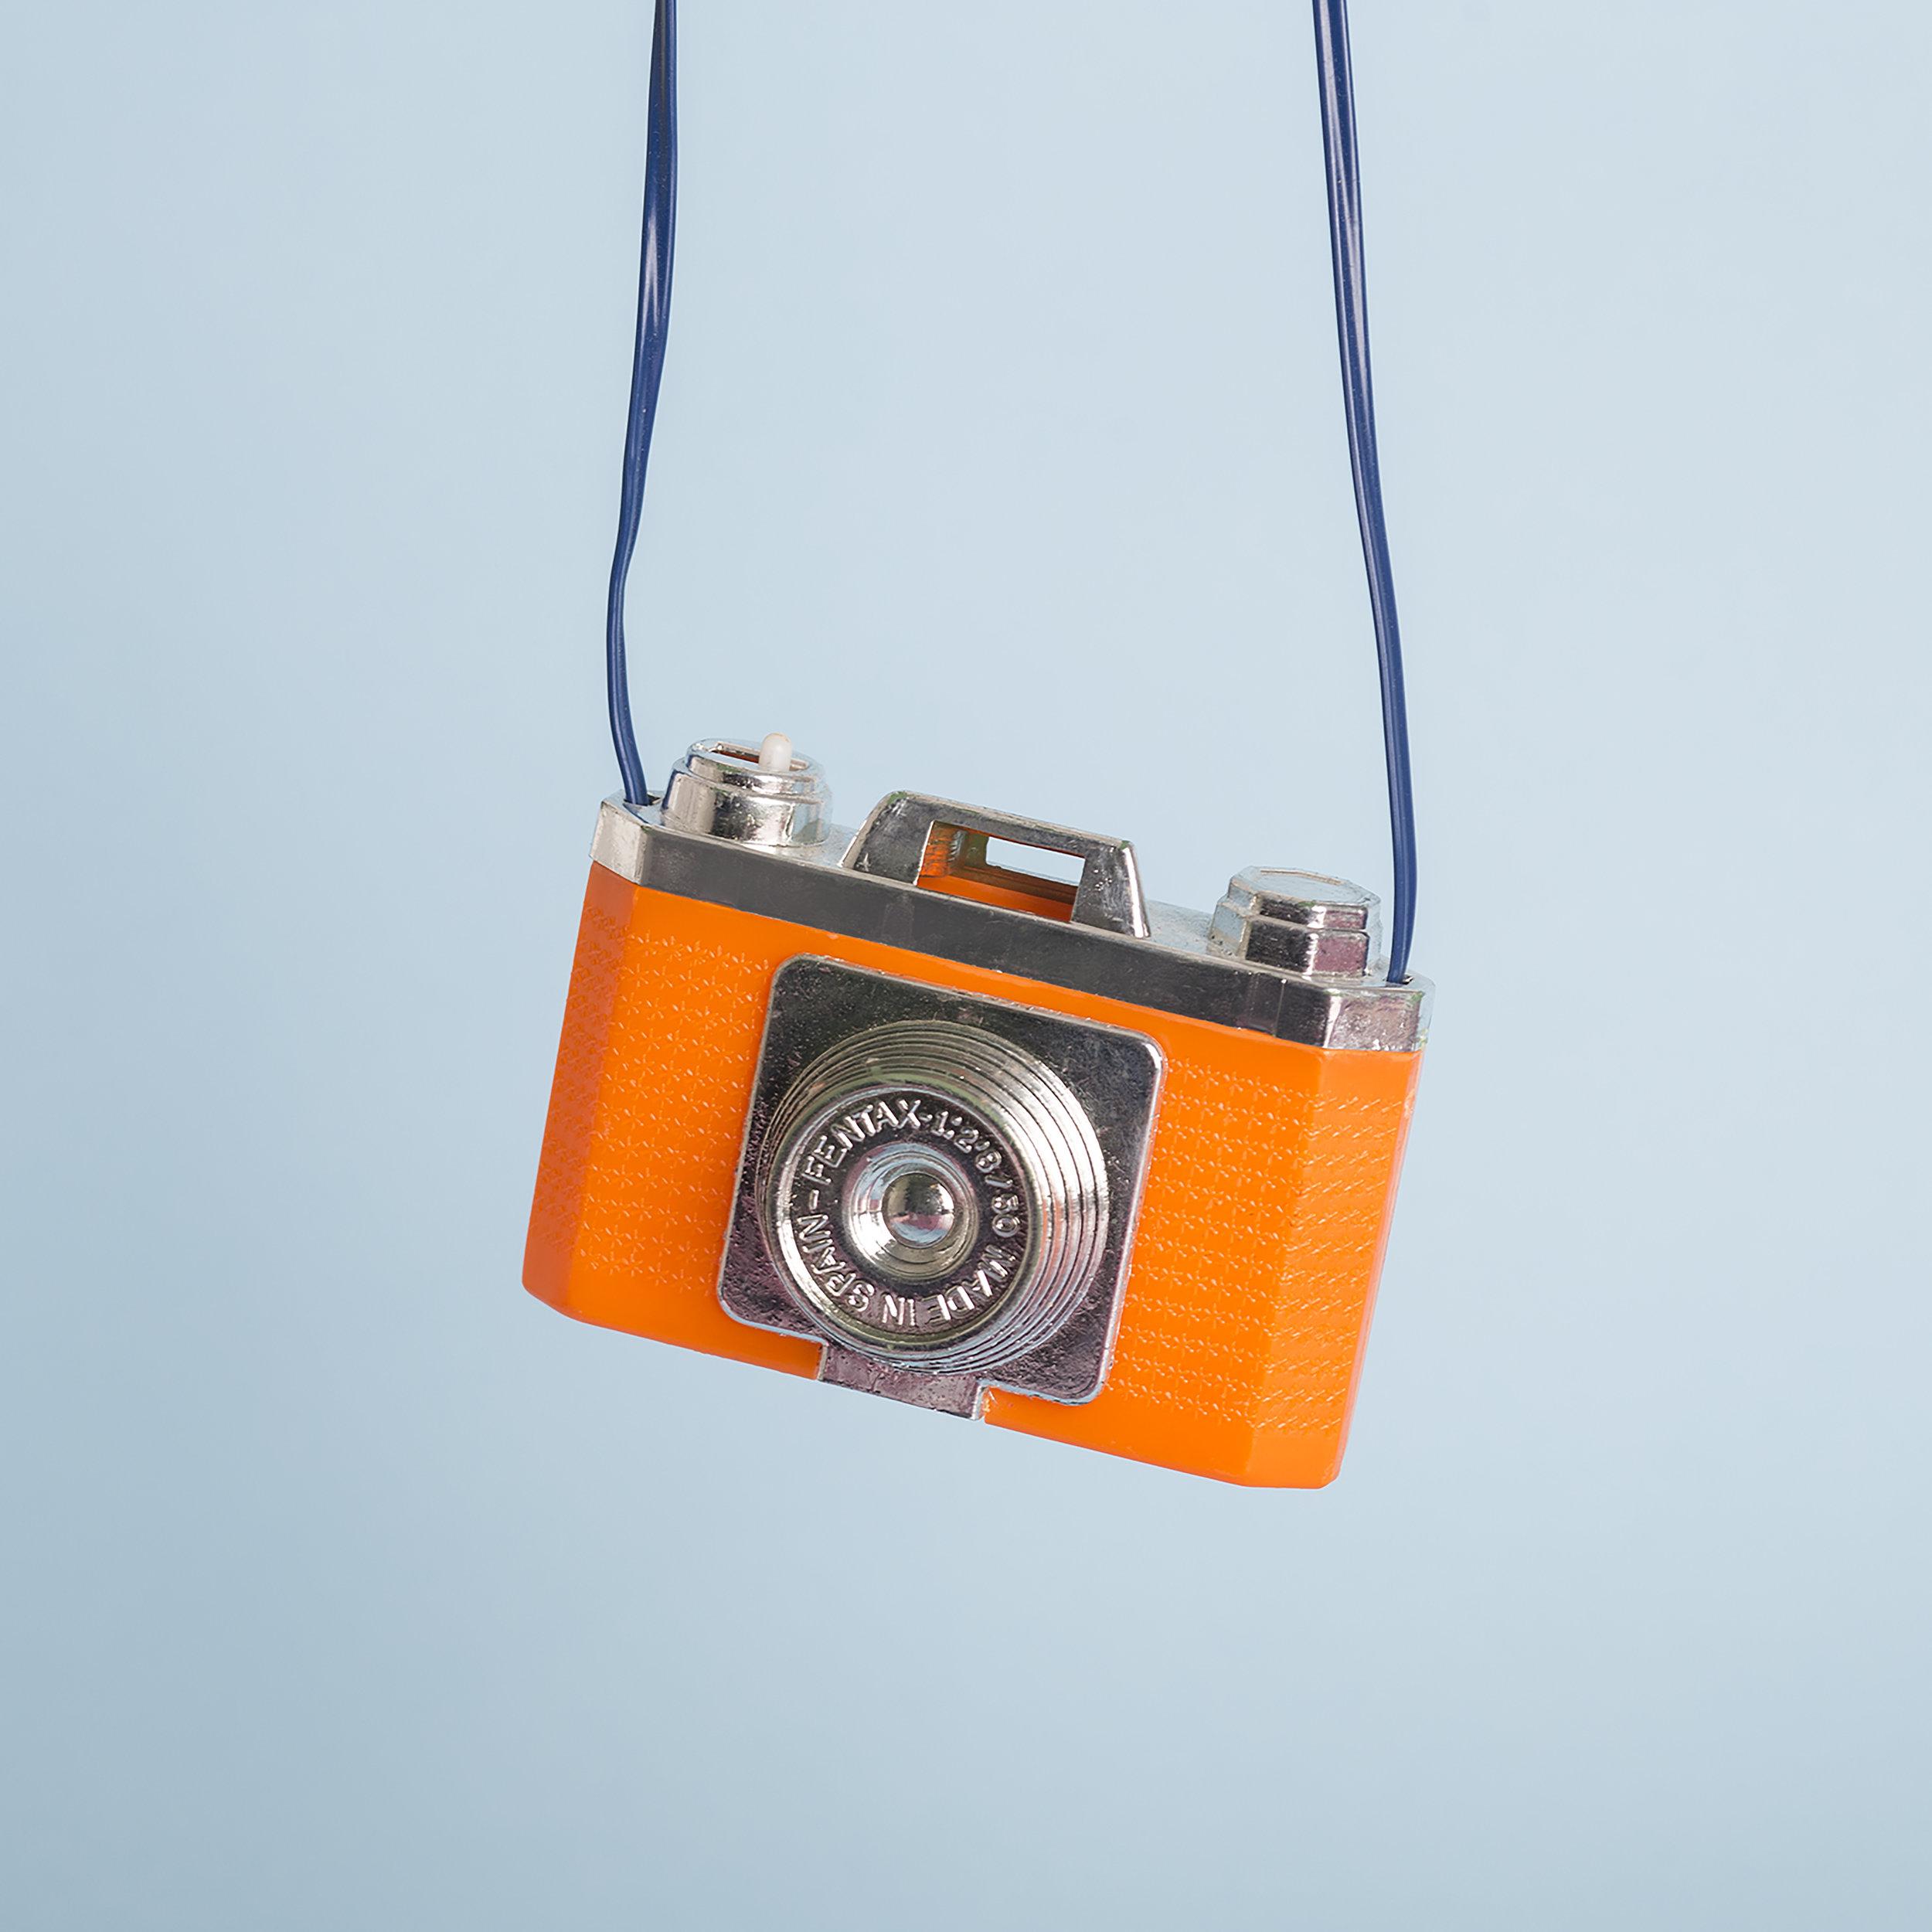 June 29th - Camera Day